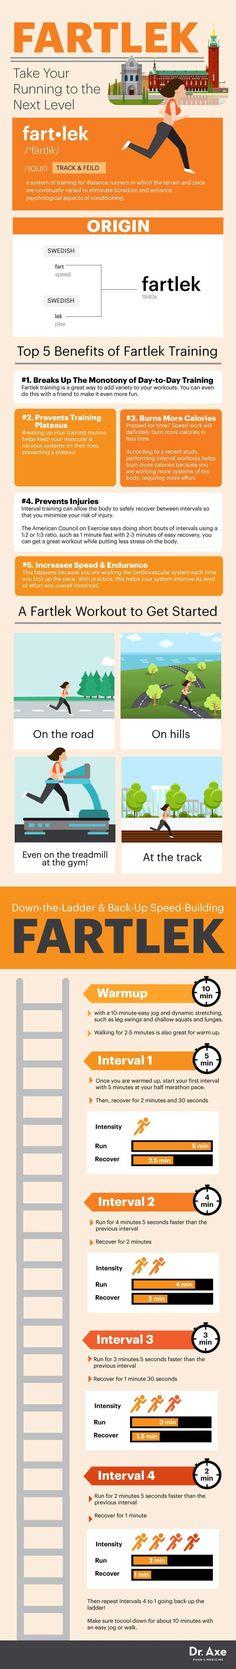 Fartlek: A Swedish Training Trick for Better Running - Dr. Axe #runningtraining